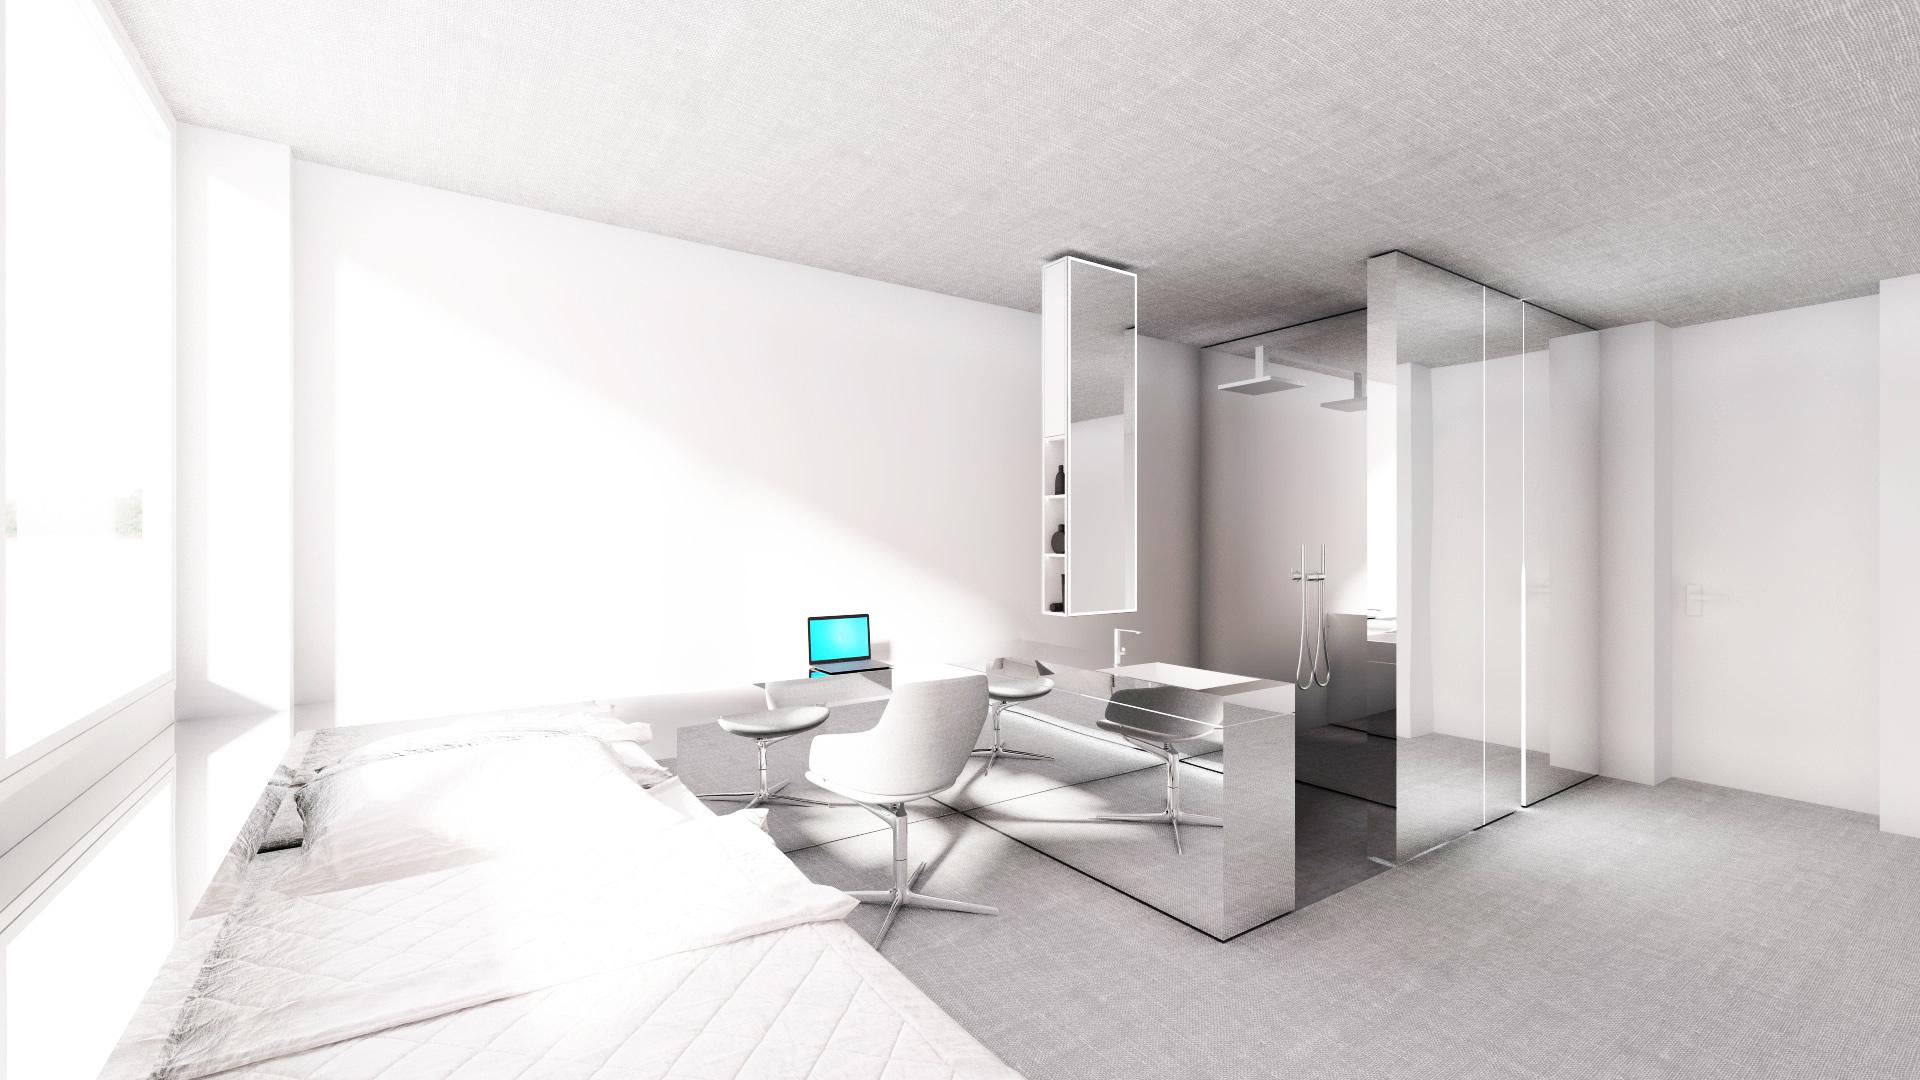 whocares_design_hotel_material (1).jpg